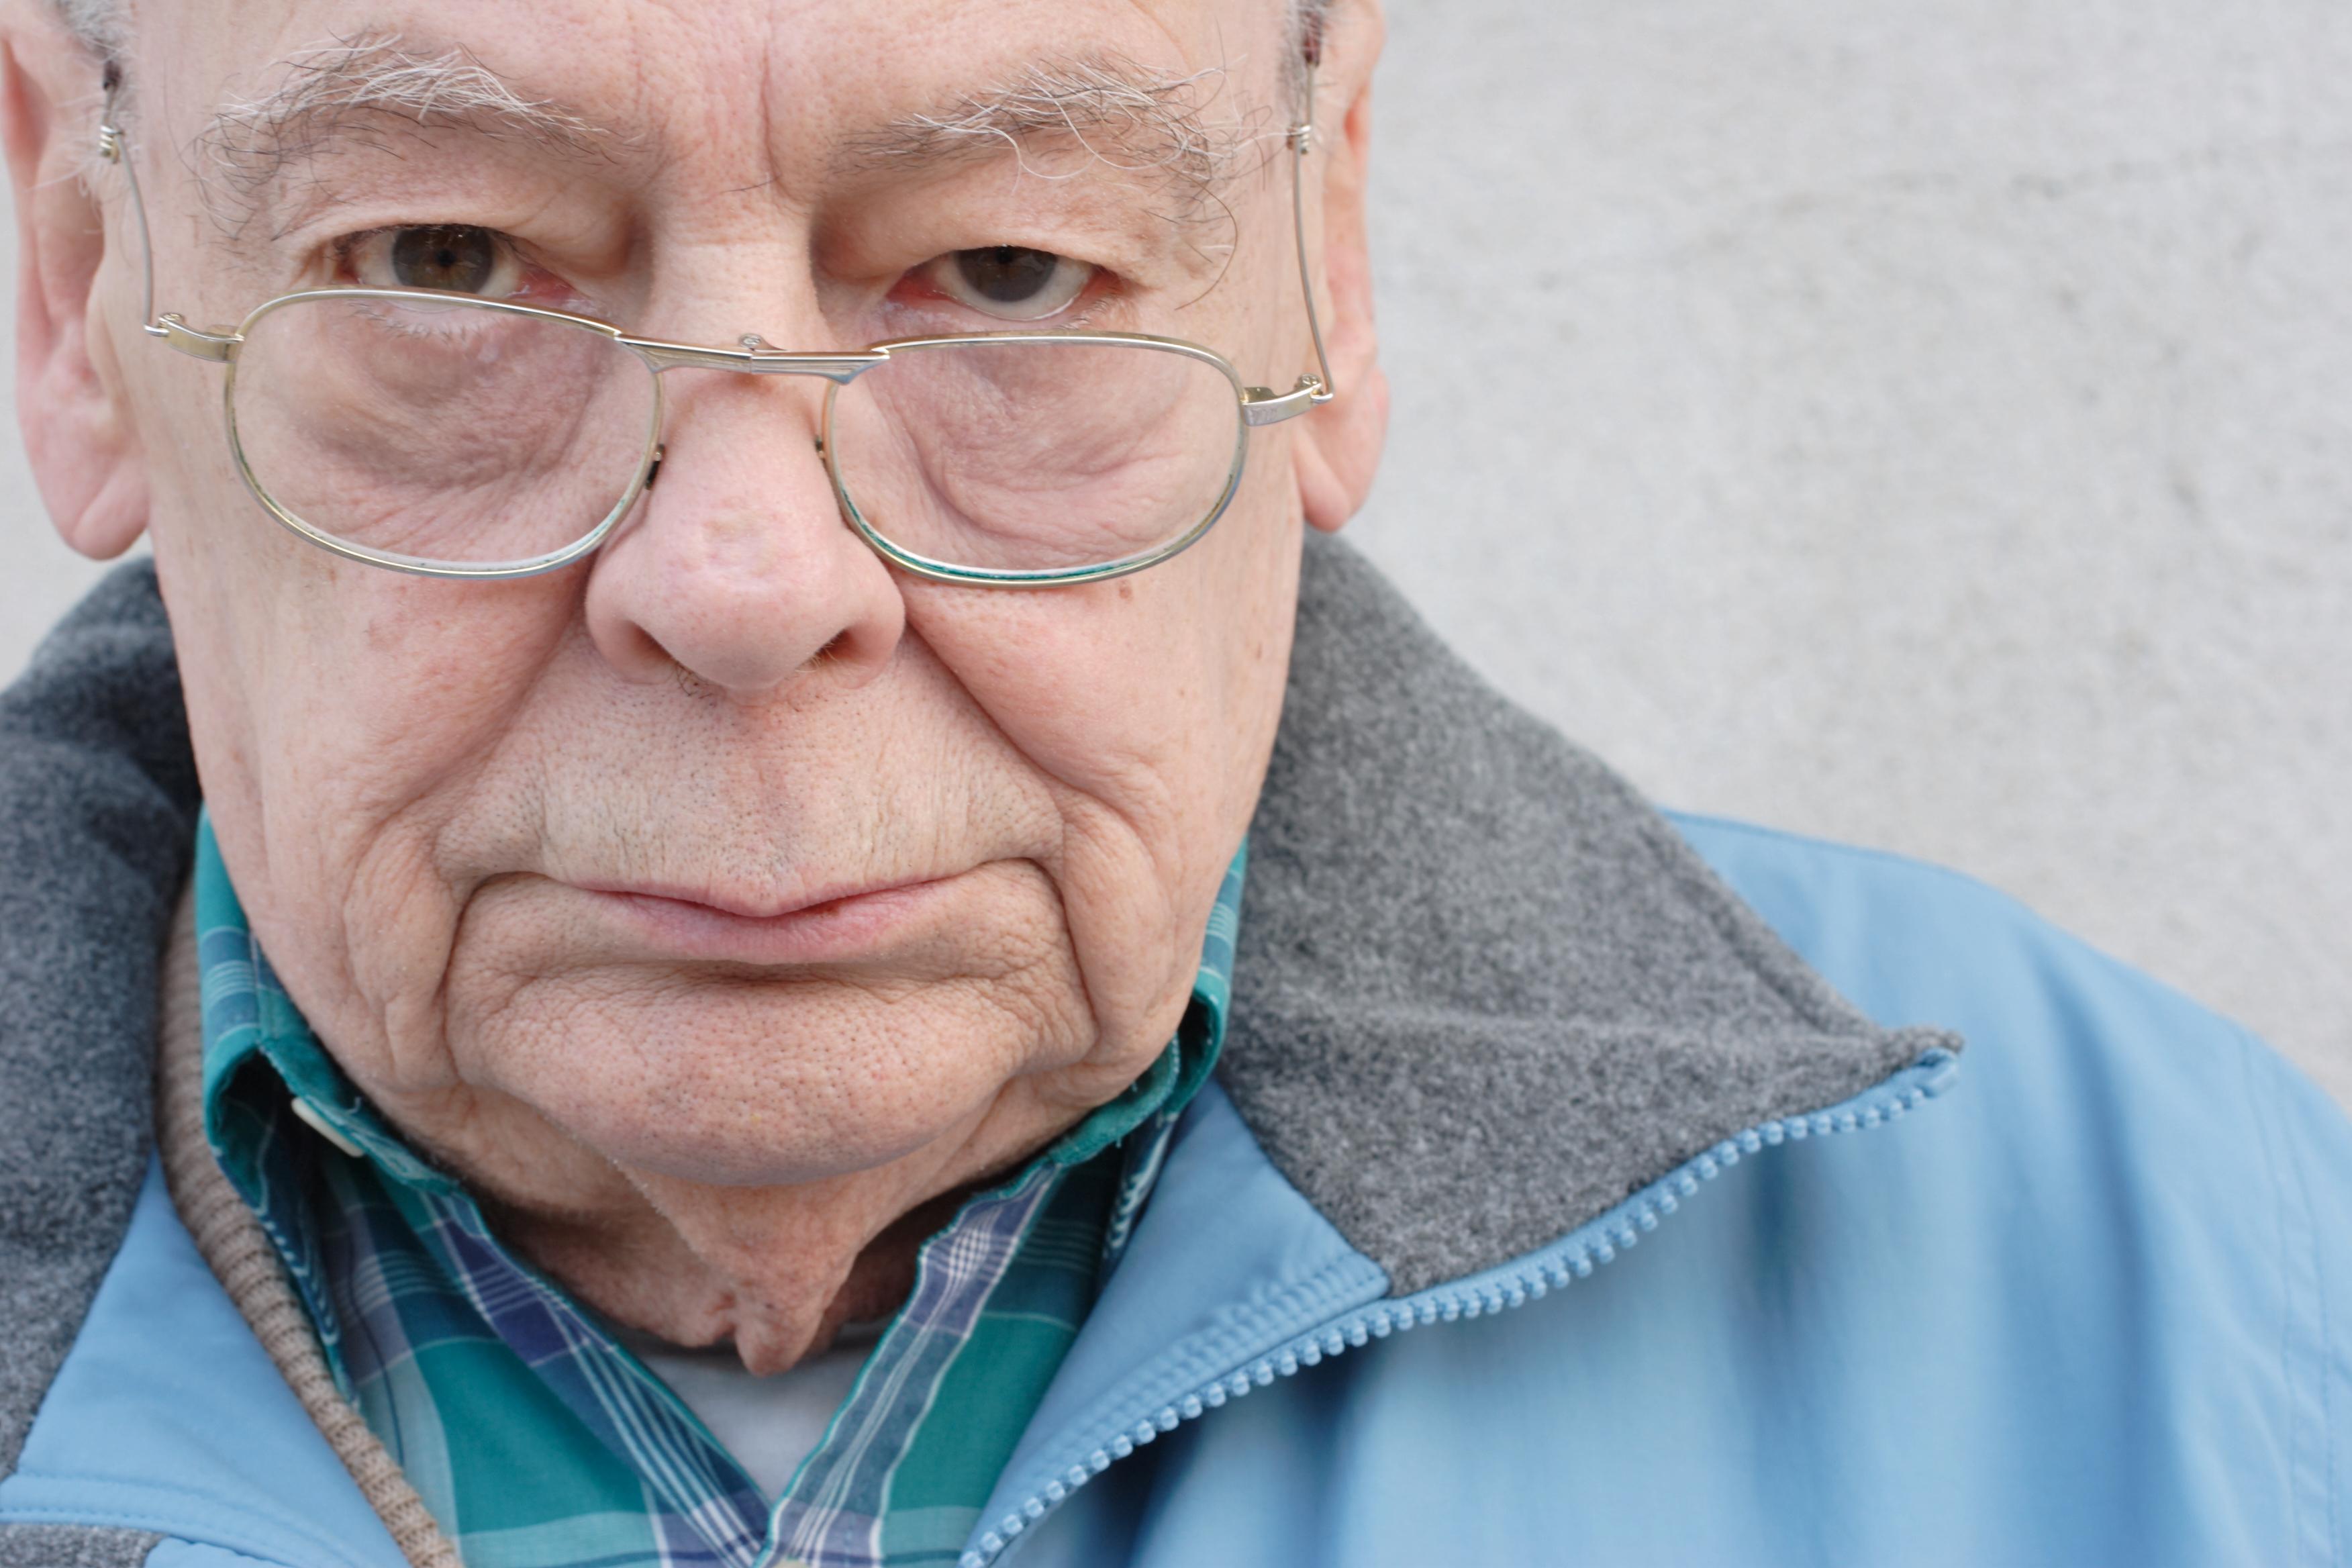 An older man looking disgruntled